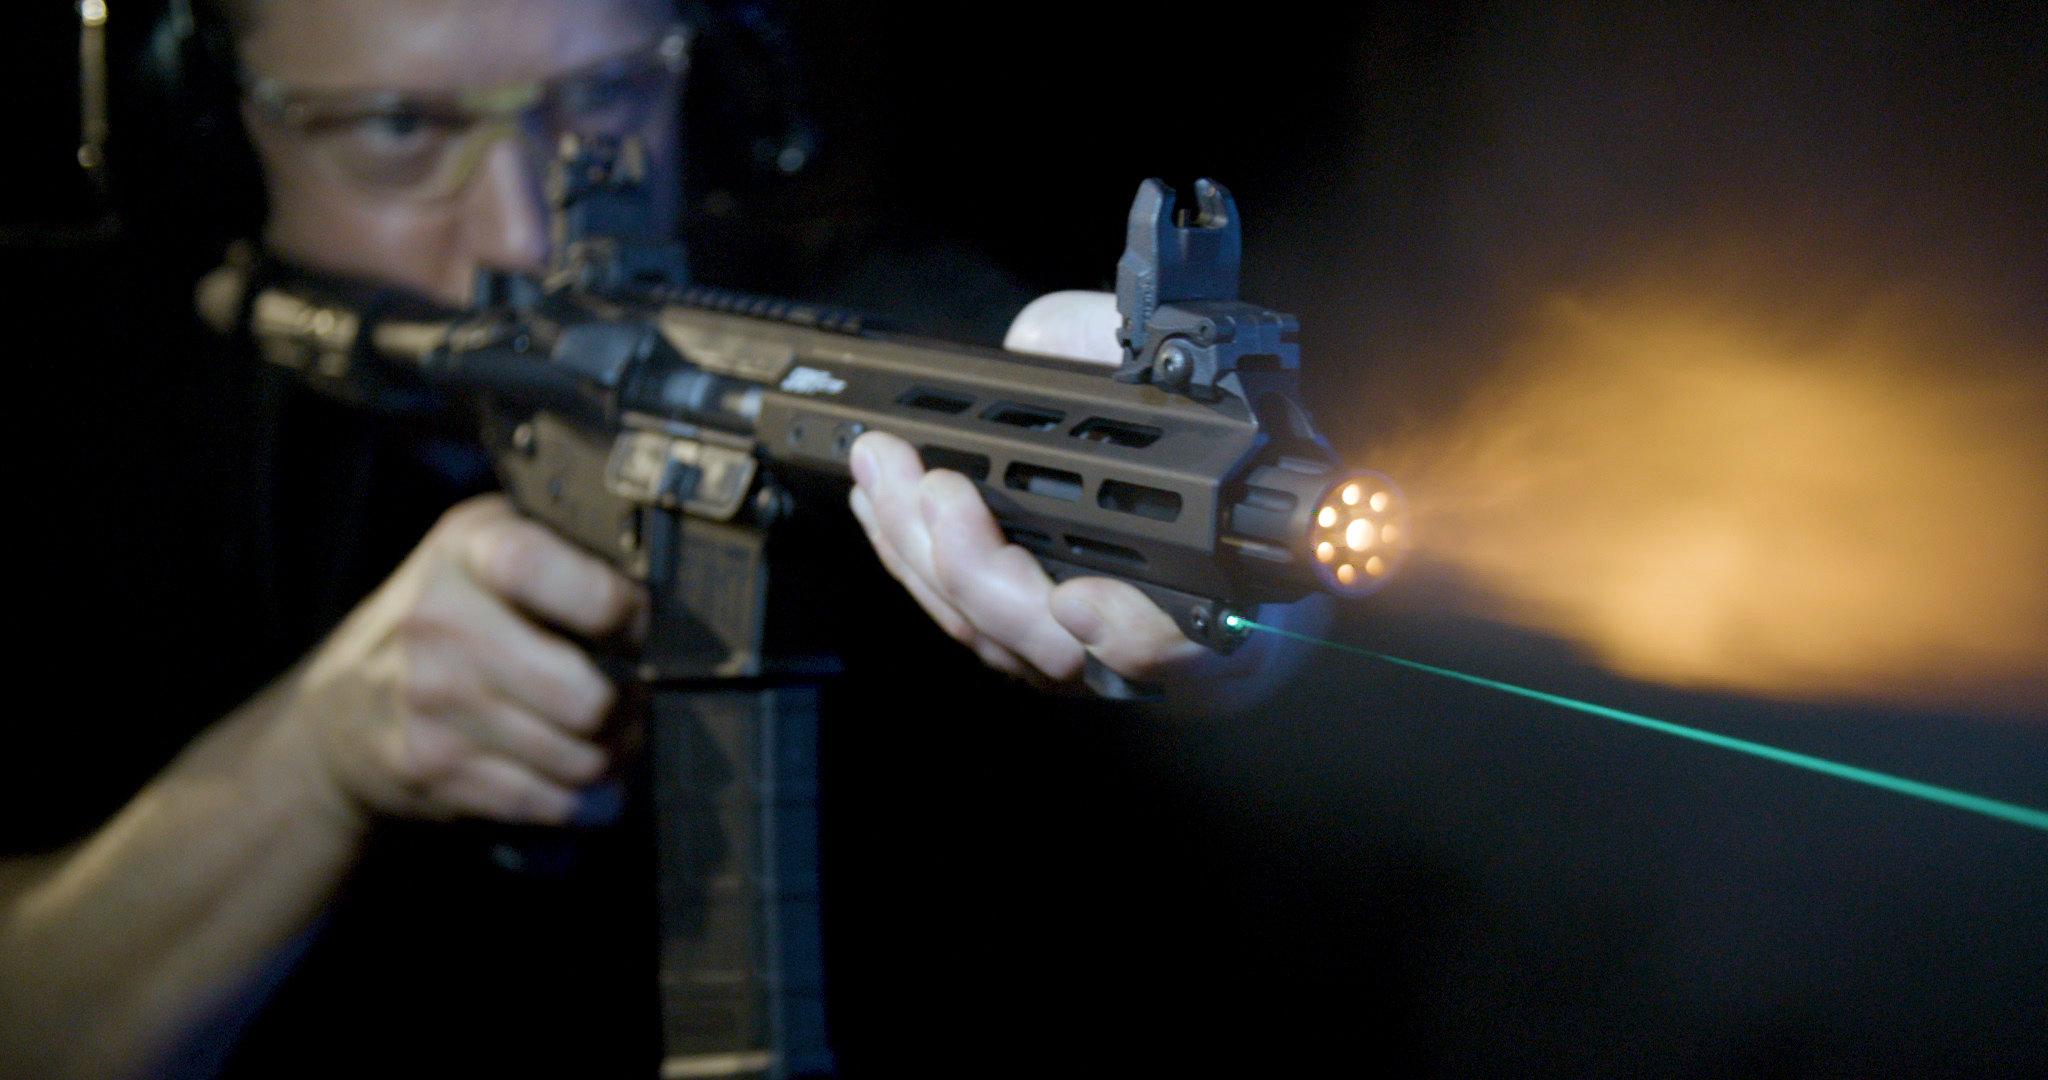 Viridian HS1 Laser Activation